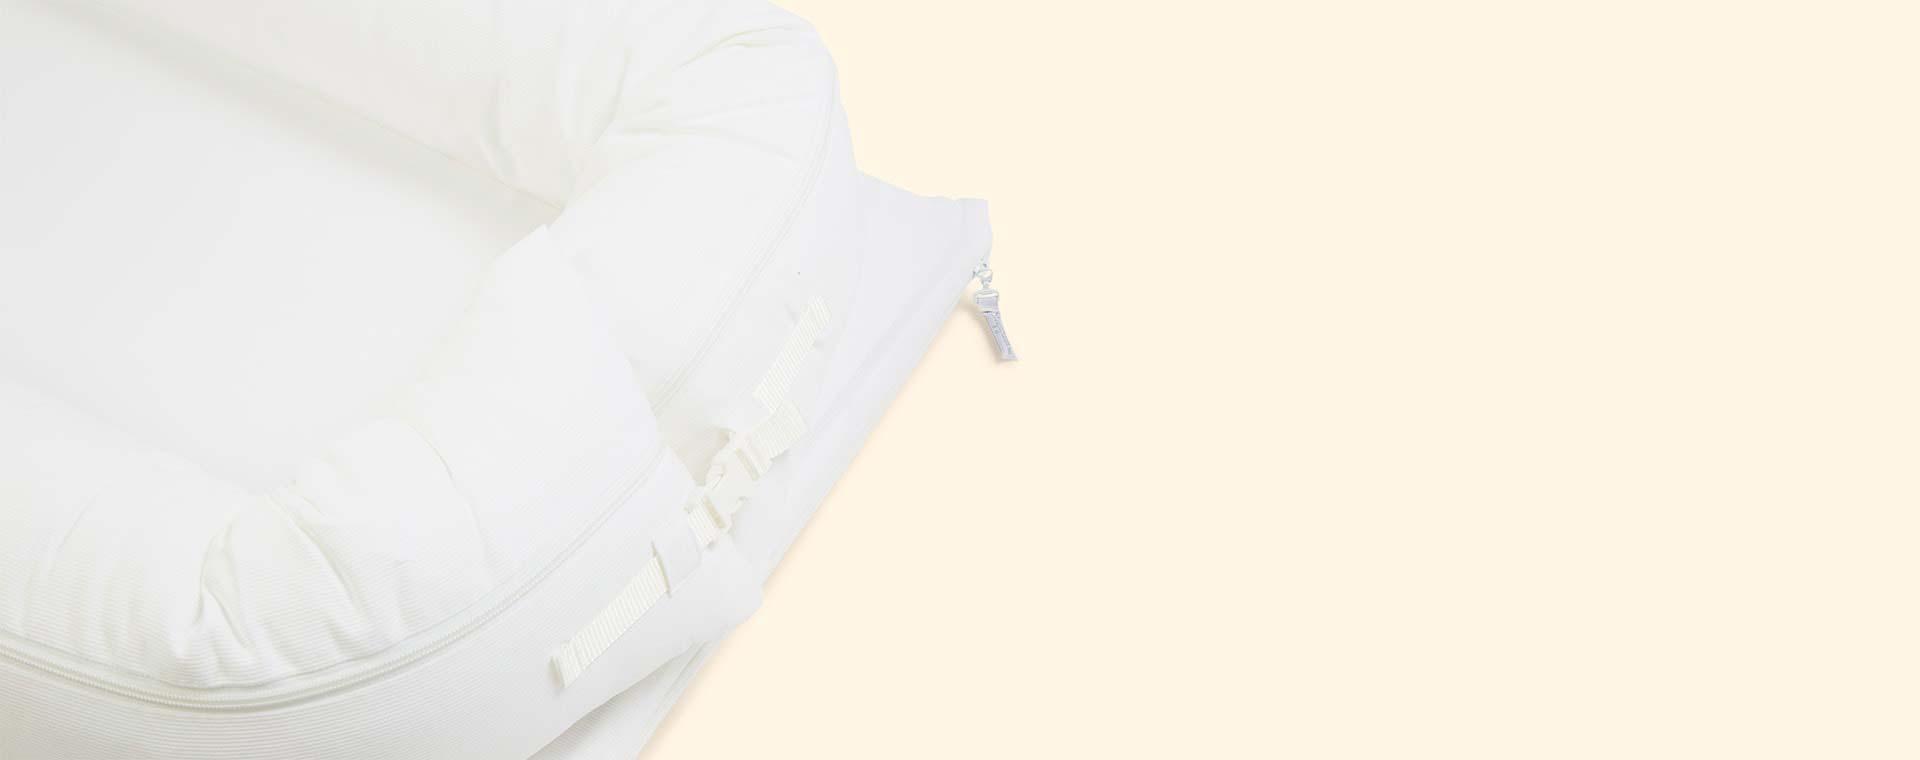 Pristine White Sleepyhead Grand Baby Pod